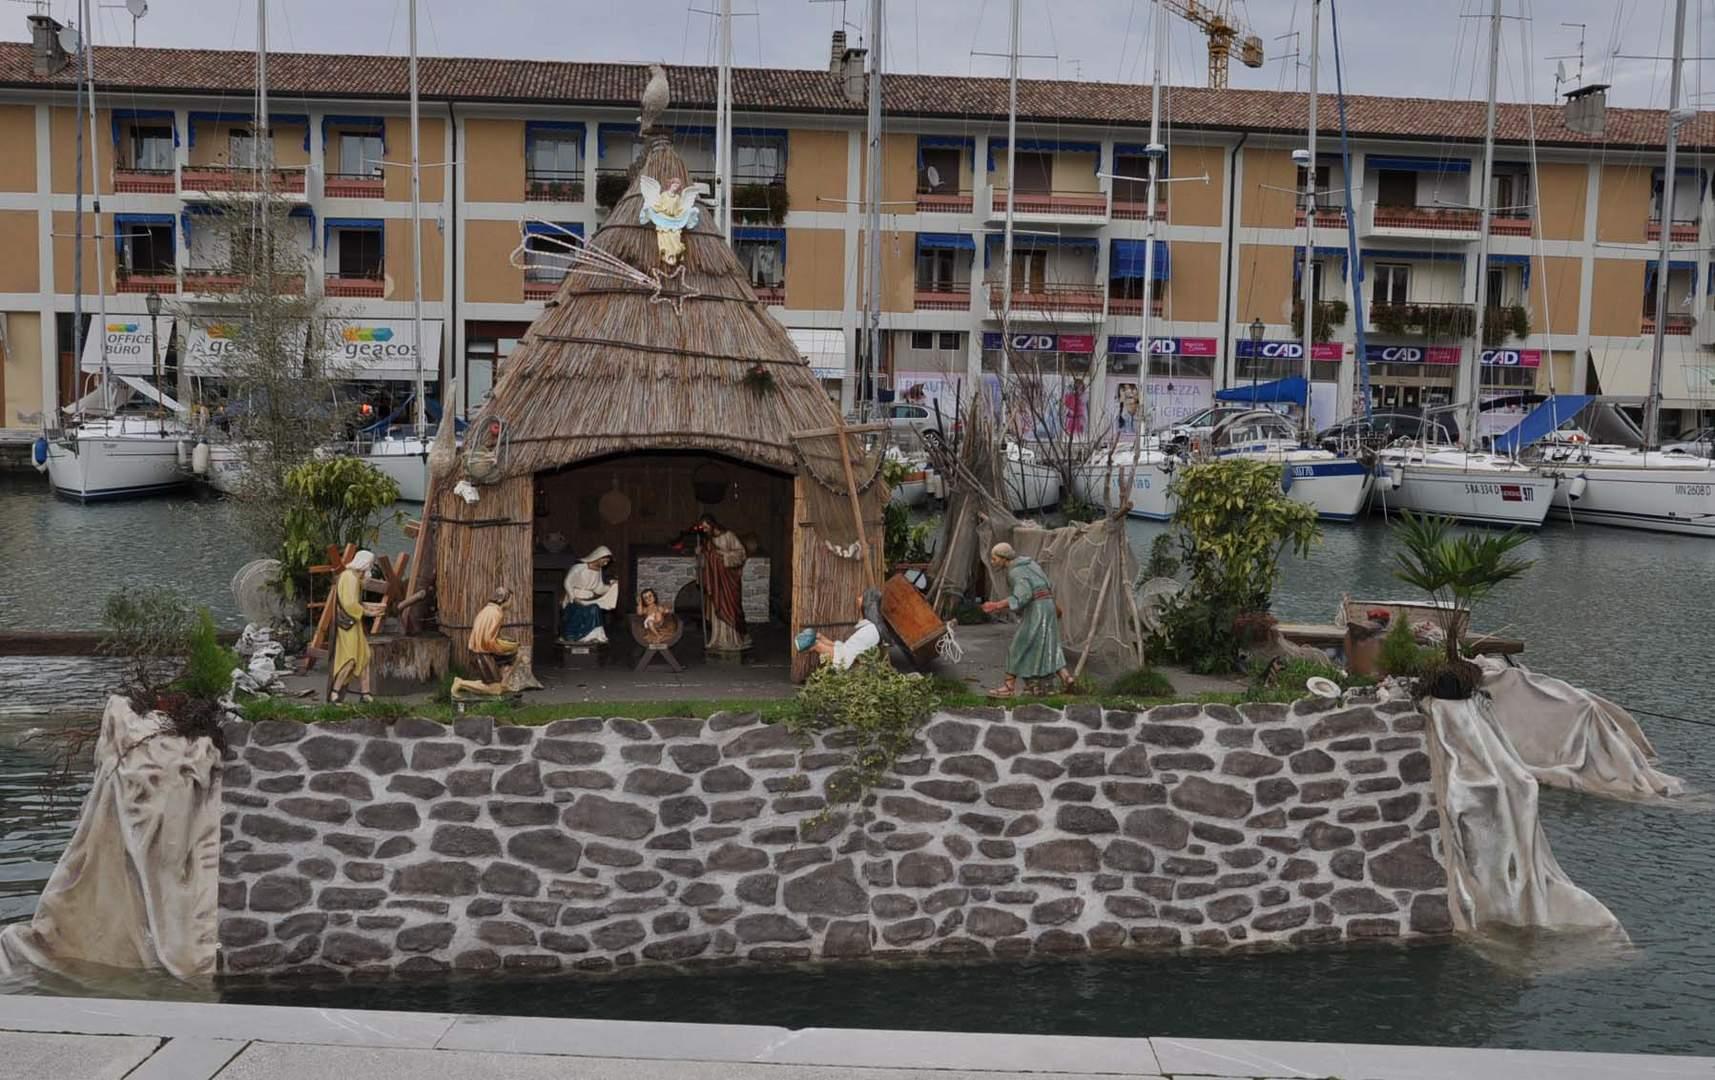 Grado - Presepe galleggiante nel porto